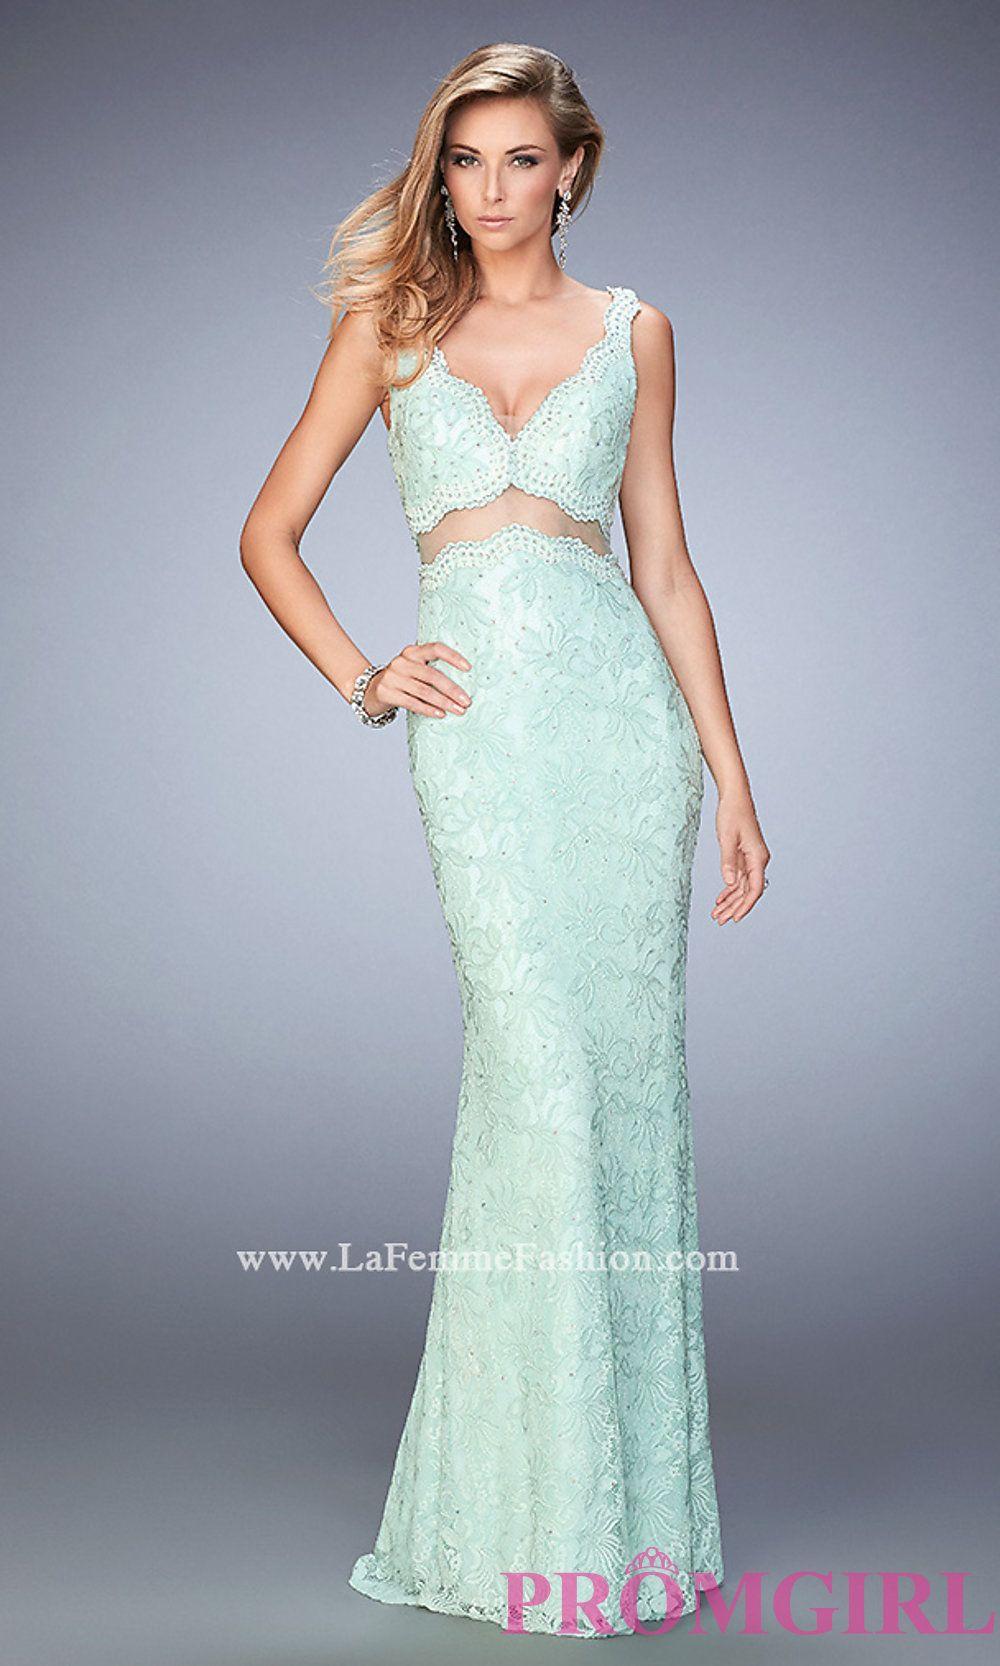 Midriff Cut Out Floor Length V-Neck Lace Dress by La Femme Style: LF ...